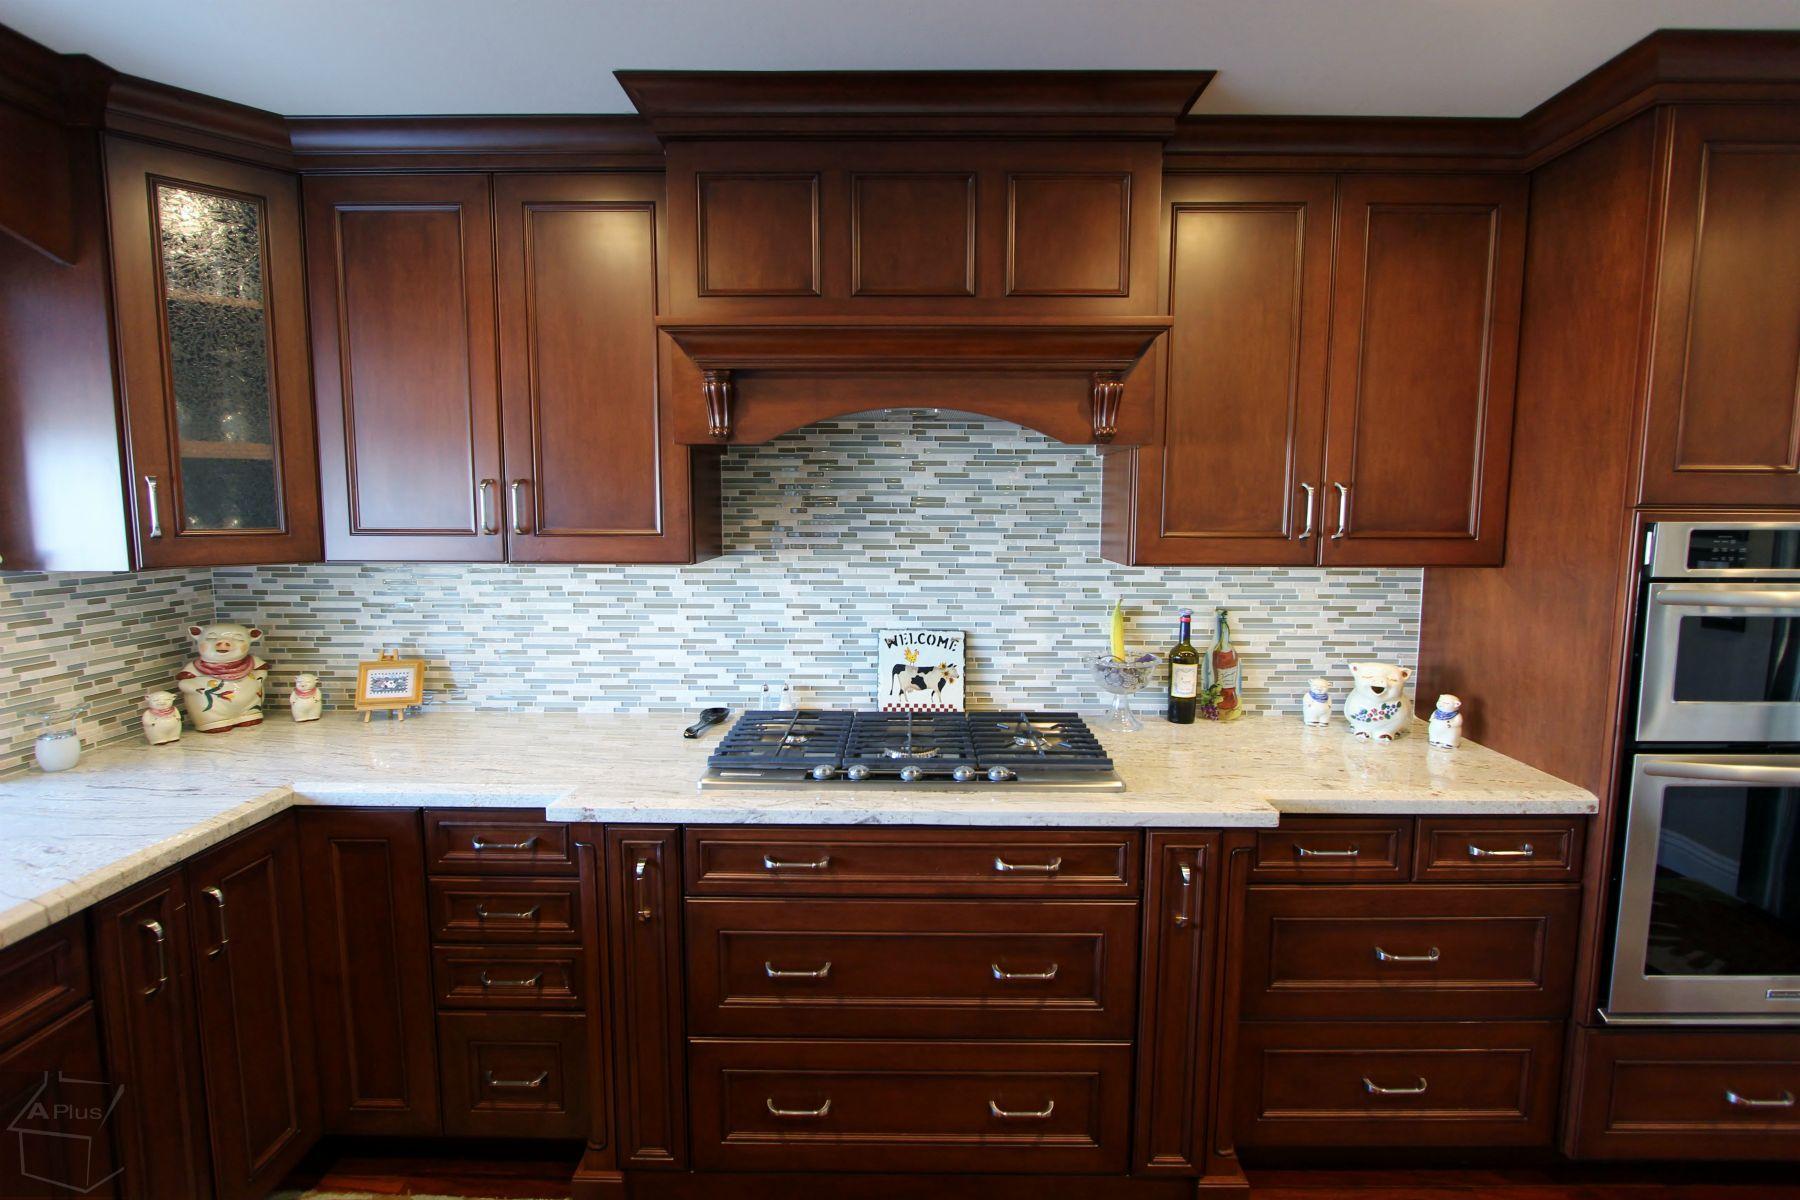 Complete home remodel mission viejo orange county kitchen bathroom